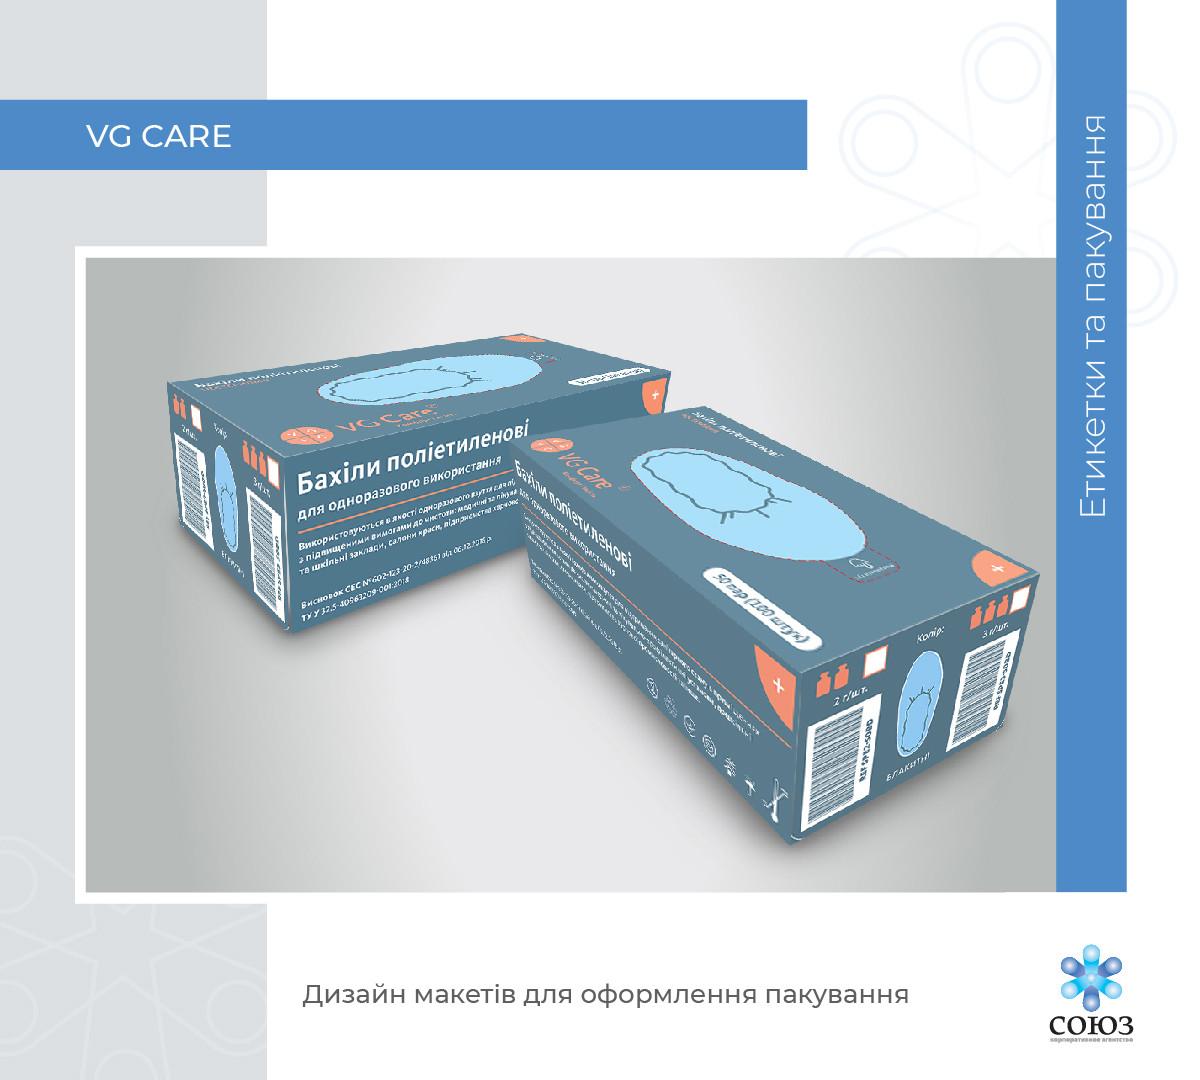 mh_design present 2021-33.jpg